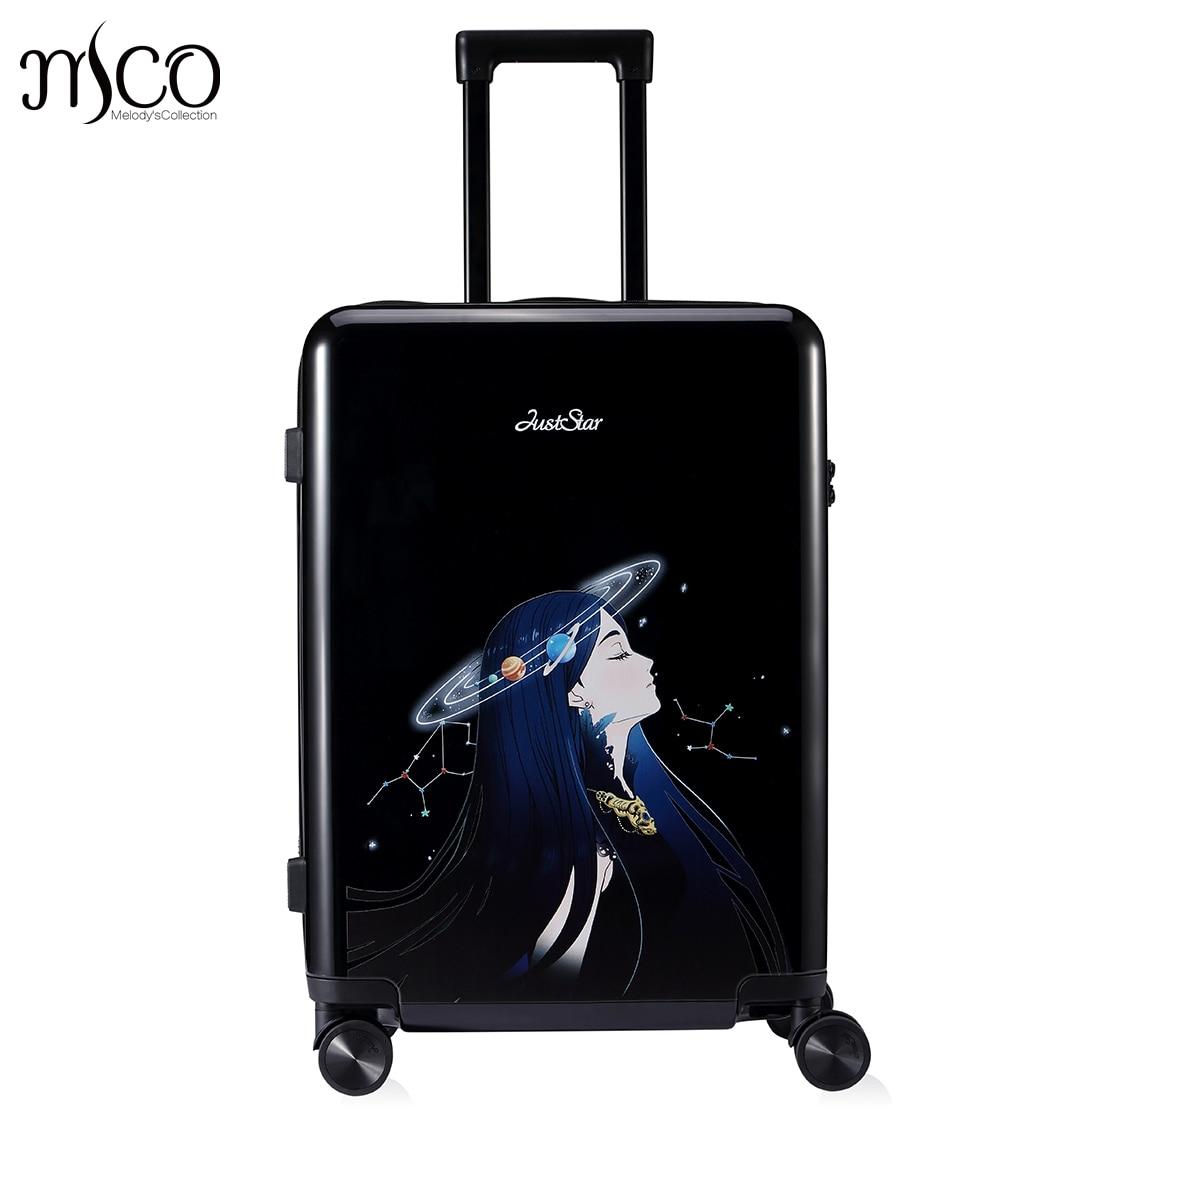 купить Just Star Women Spinner trolley Braccialini Harajuku travel case TSA Girls Rolling Luggage PC Hardside Trolley Boarding Luggage недорого